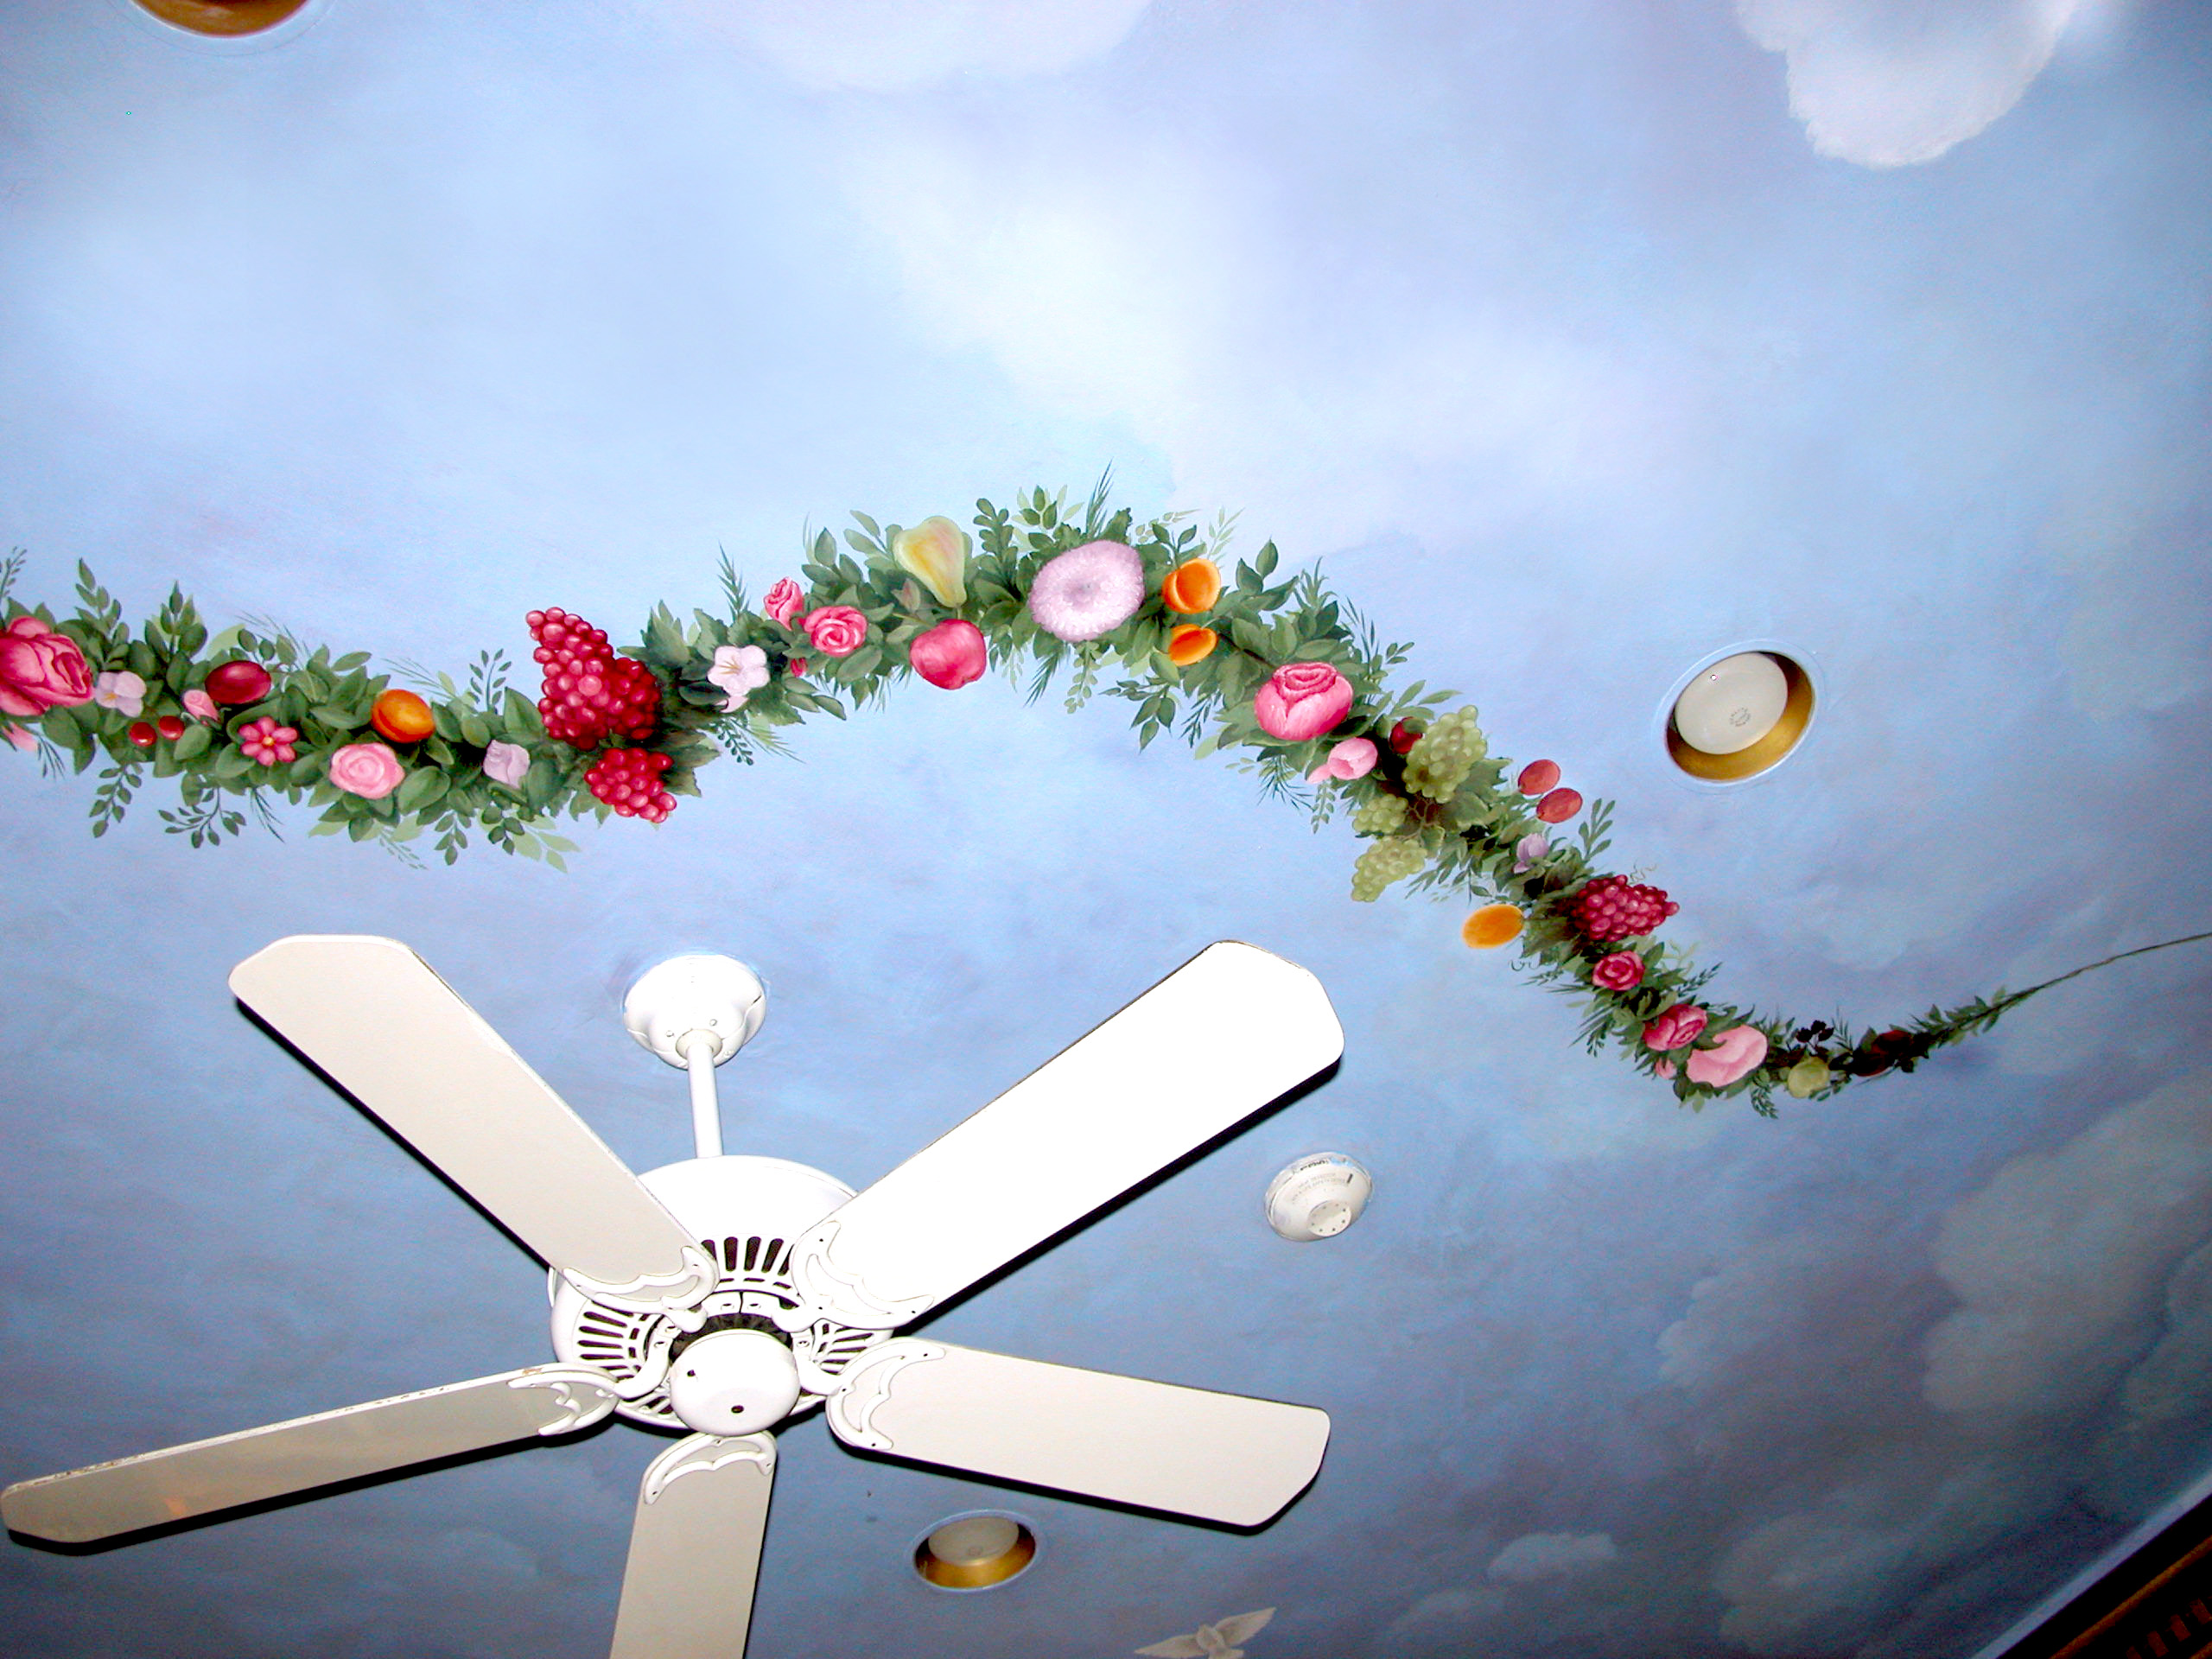 Mural Ceiling  Idea Demarset Nj